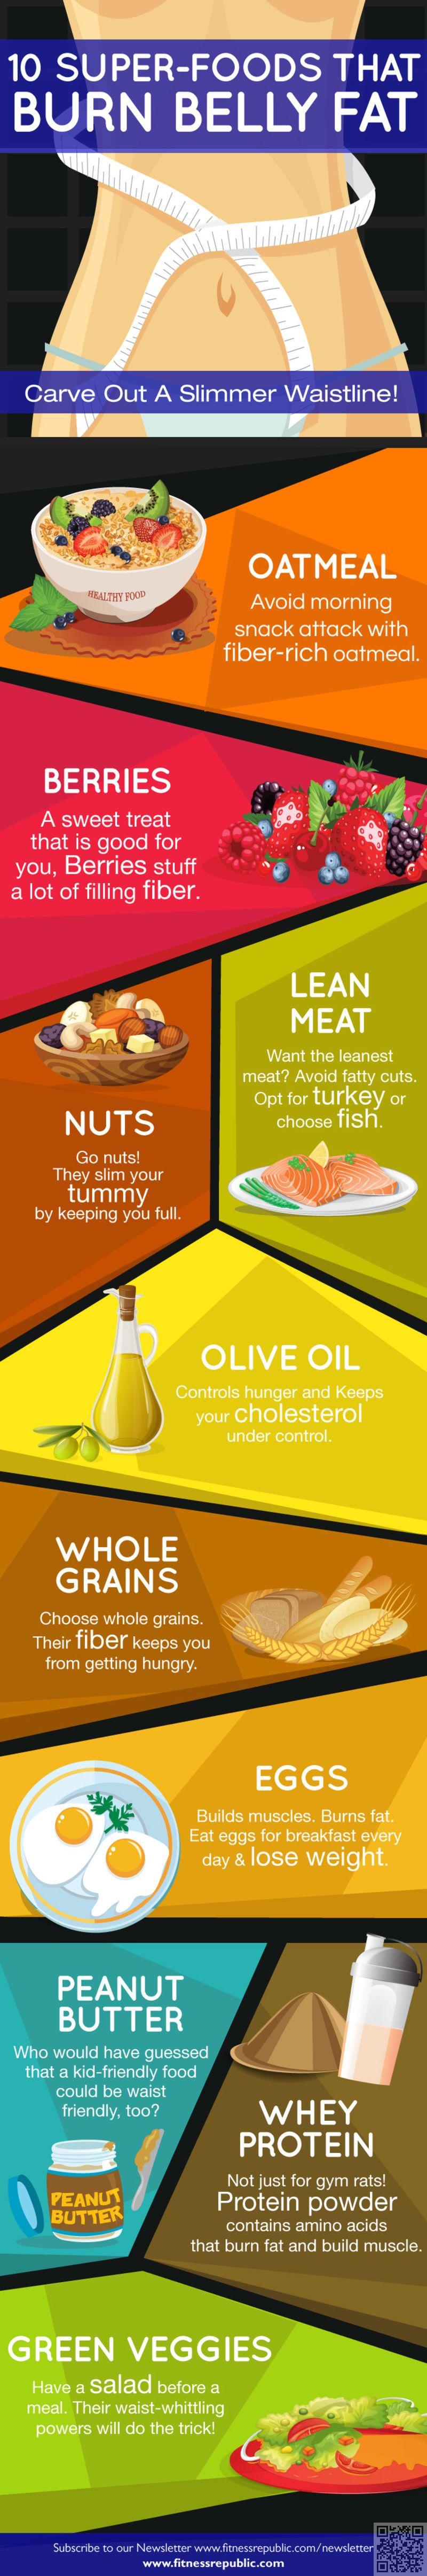 10 Super Foods That Burn Belly Fat